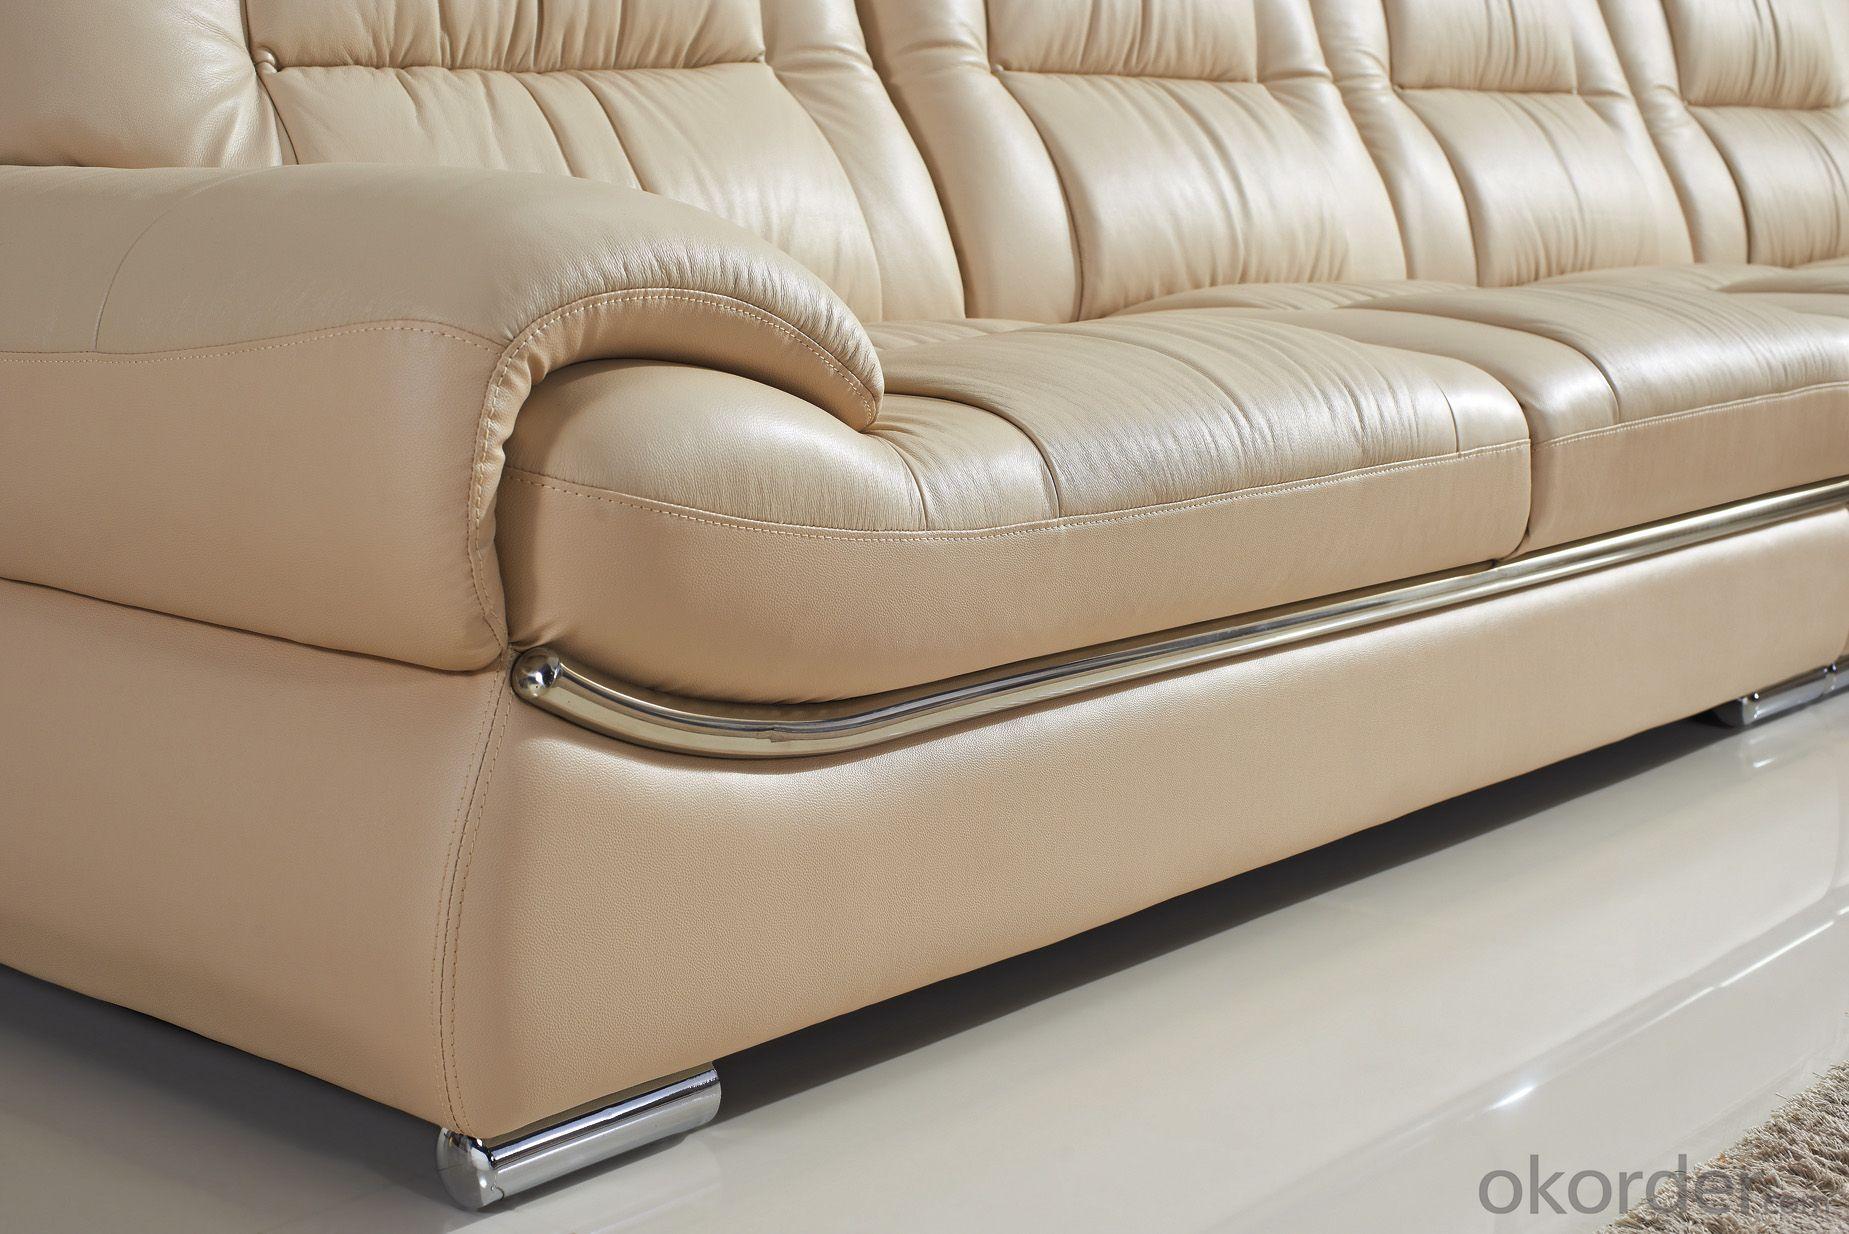 CNBM US popular leather sofa set CMAX-11